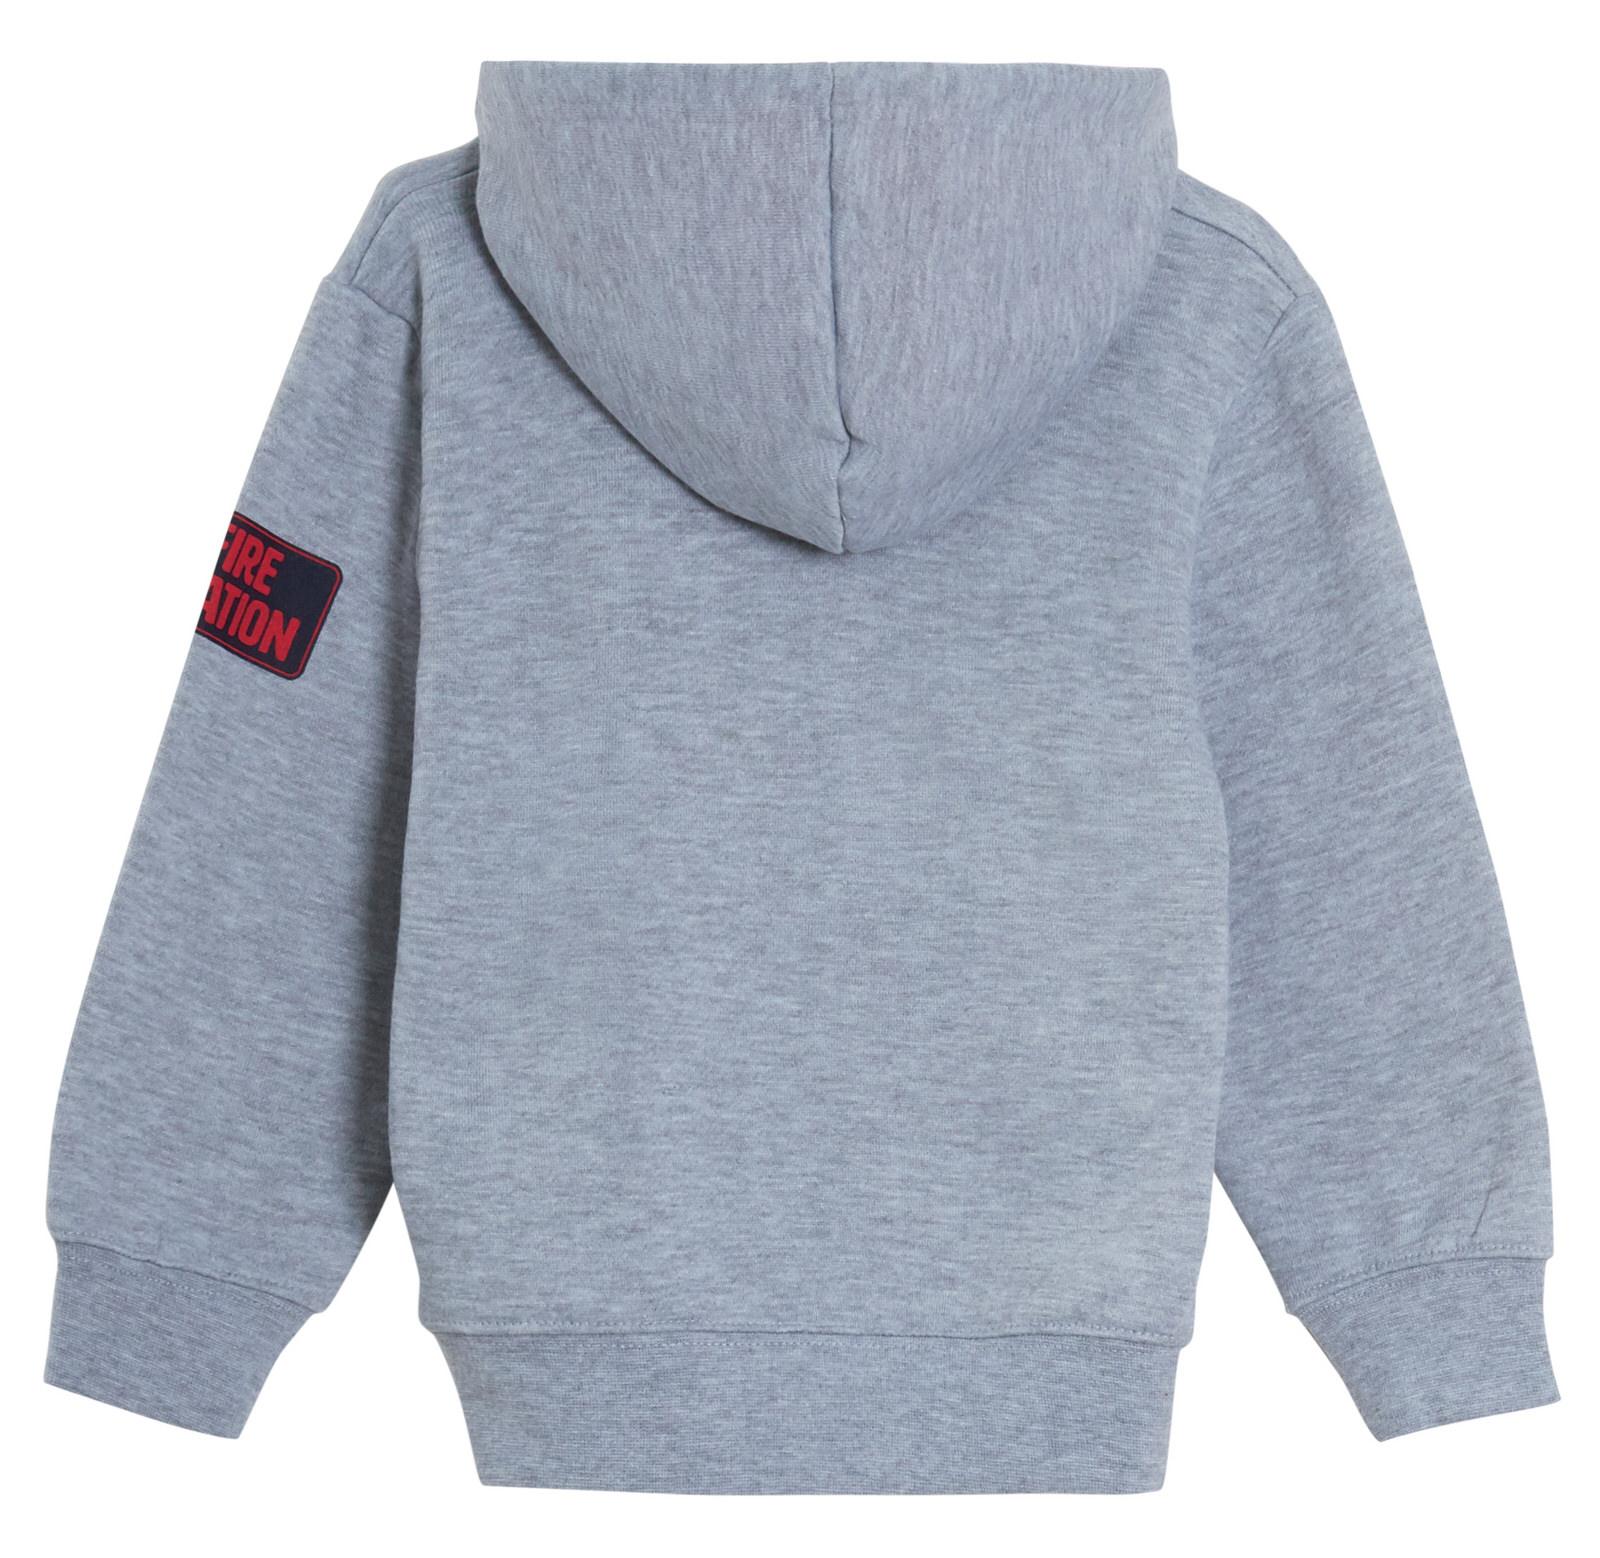 Fireman Sam Boys Hooded Jacket Kids Fleece Hoodie Jumper Sweatshirt with Novelty Lift Up Badge